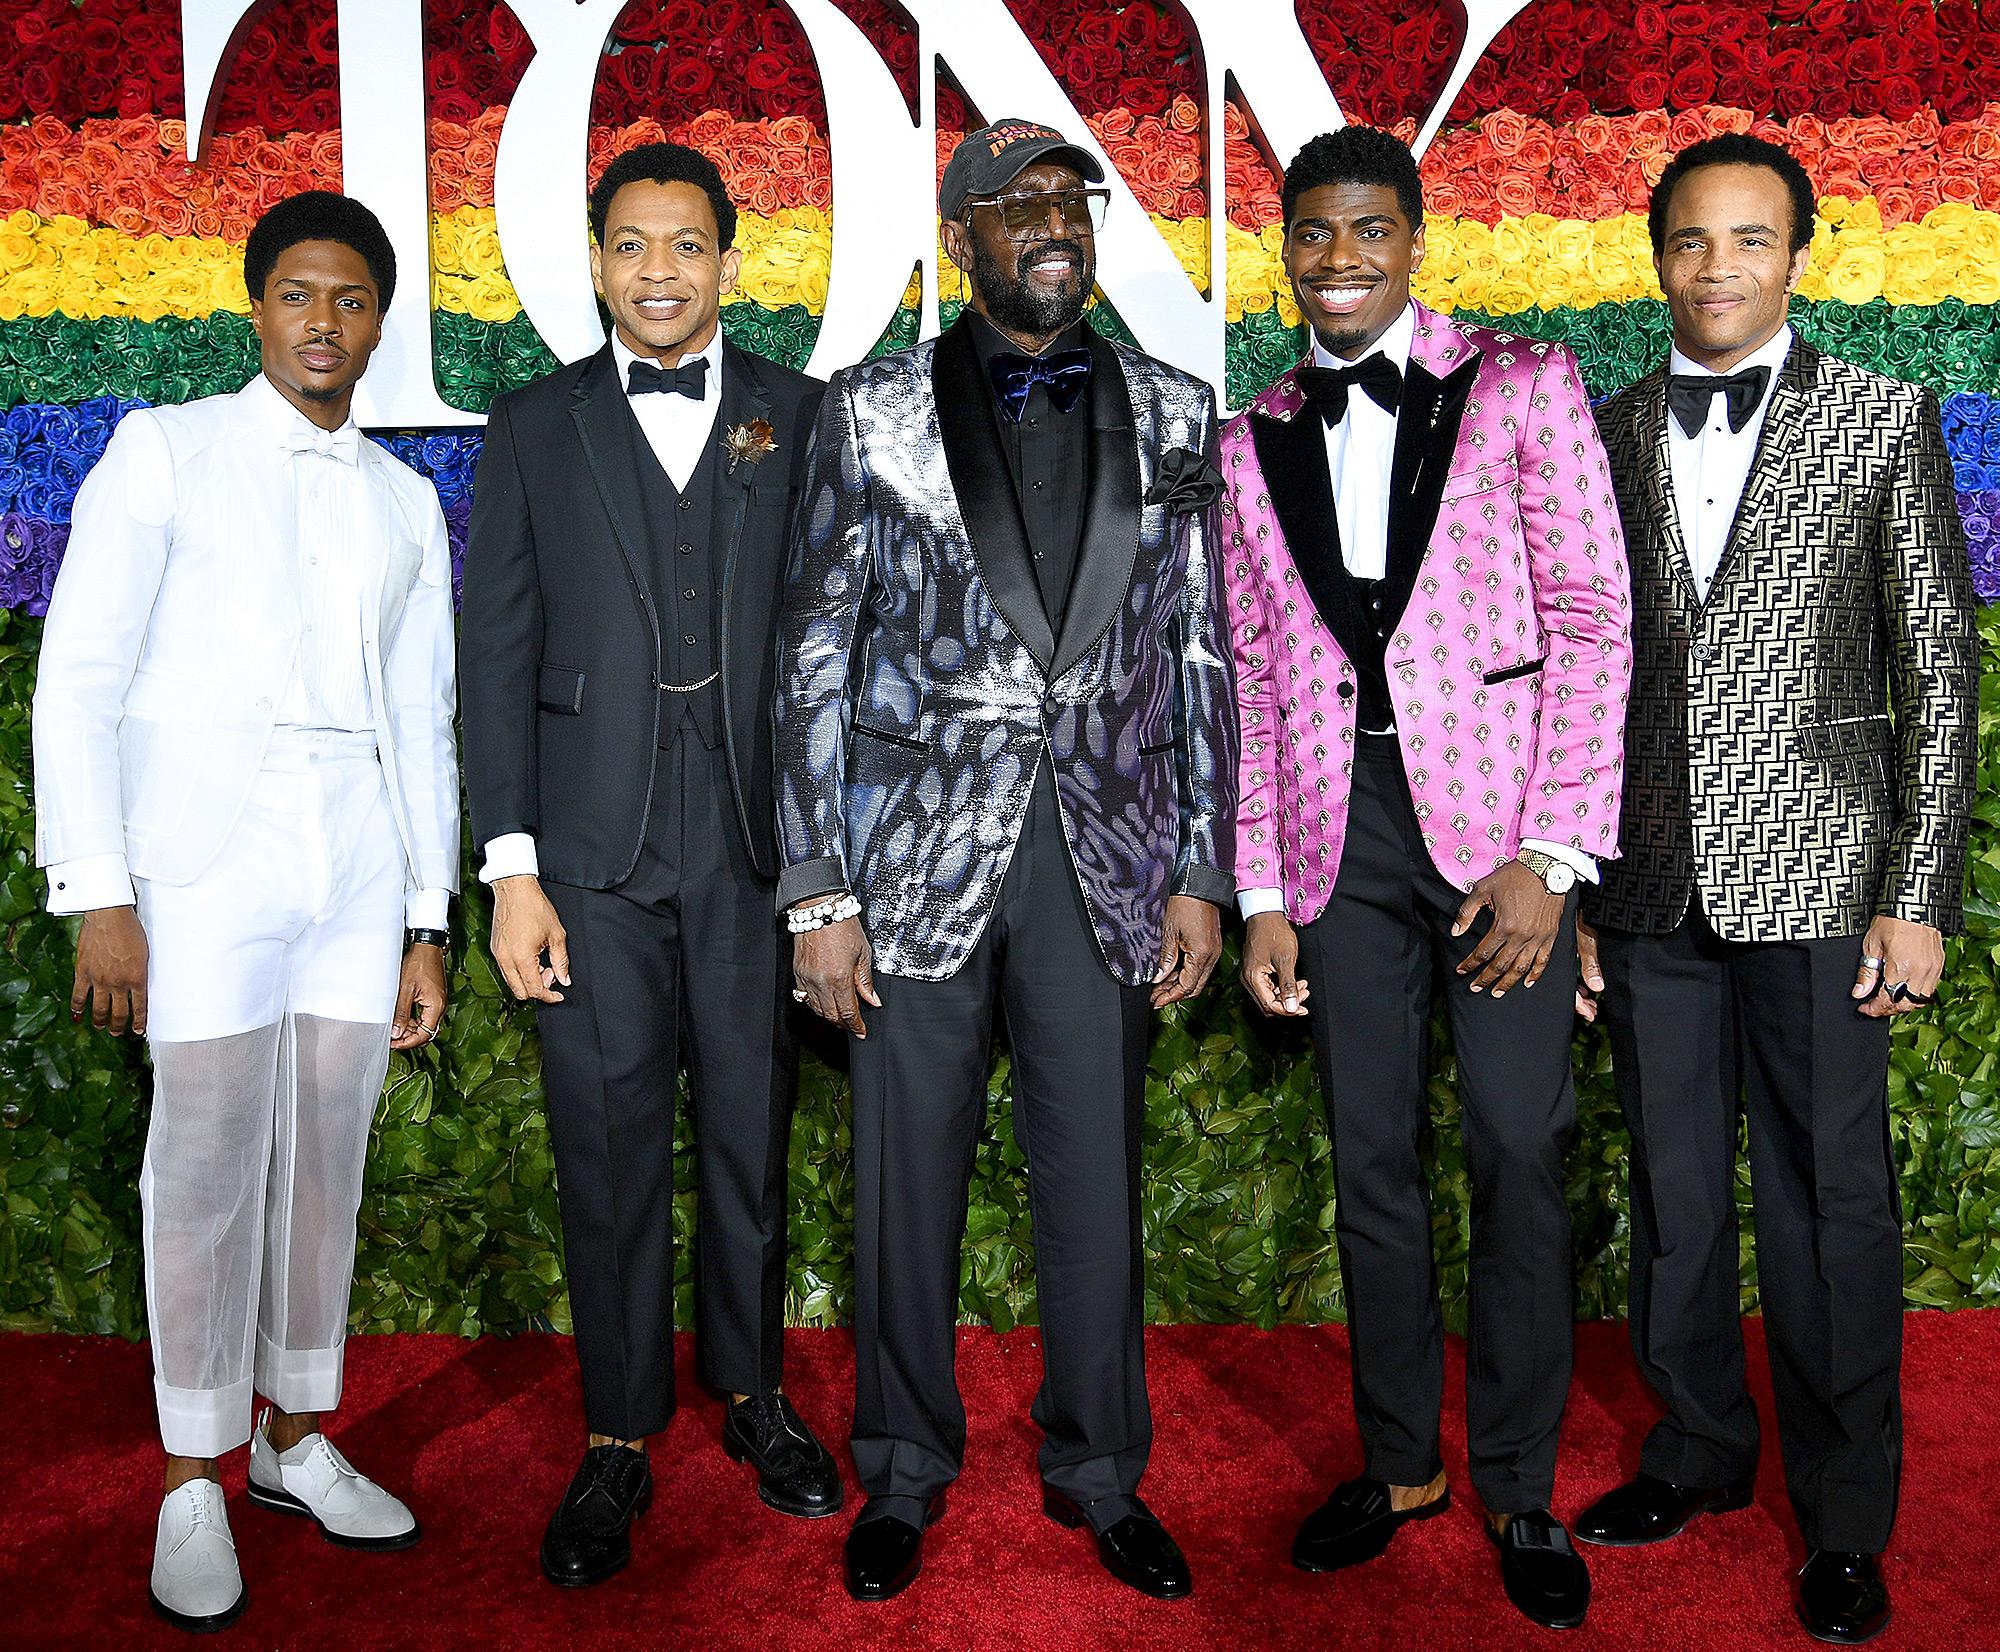 Ephraim Sykes, Derrick Baskin, Otis Williams, Jawan M. Jackson, and James Harkness